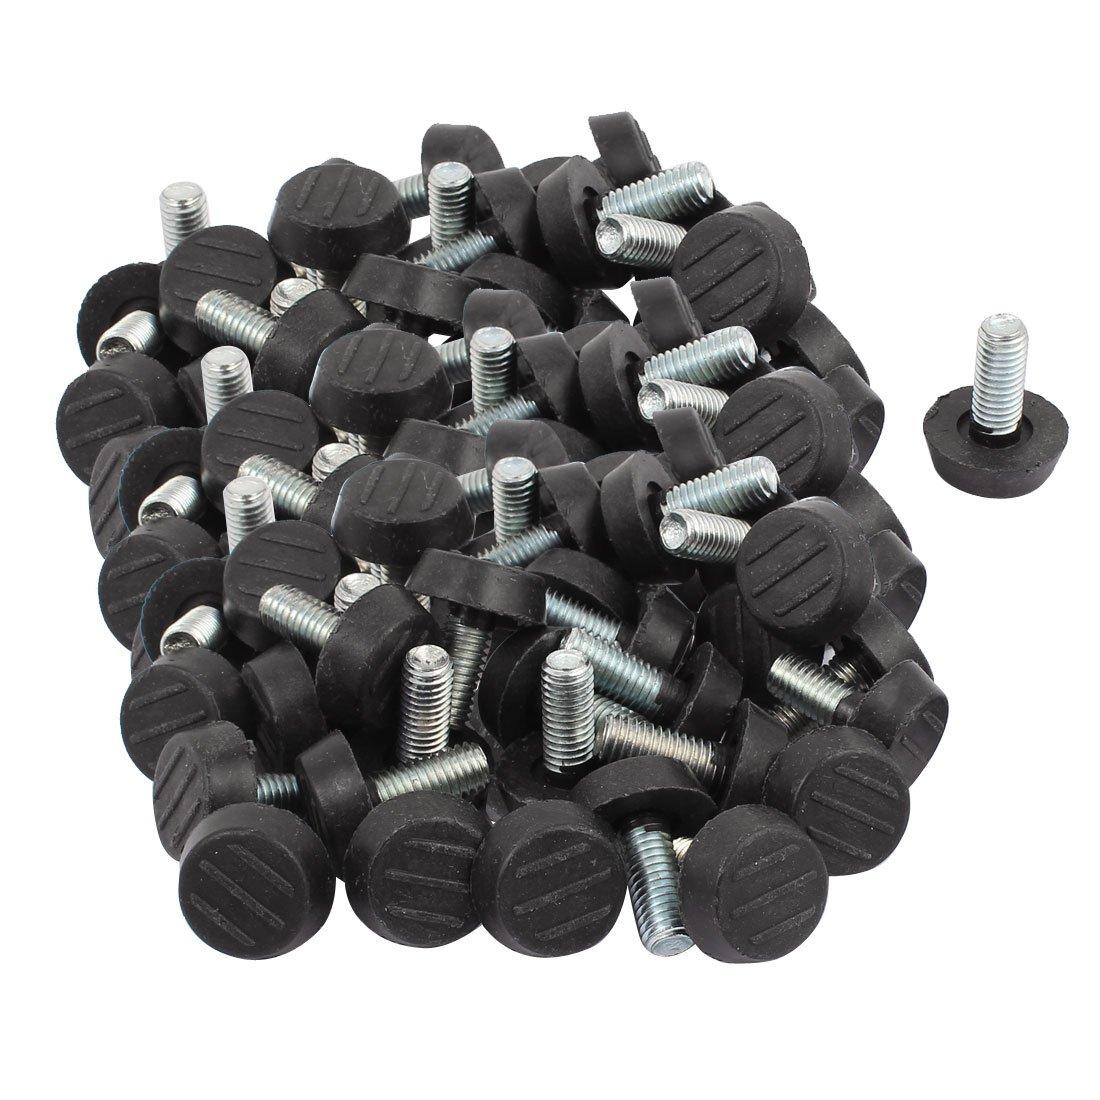 uxcell Furniture Table M8x20mm Plastic Base Thread Stem Adjustable Leveling Feet 100pcs